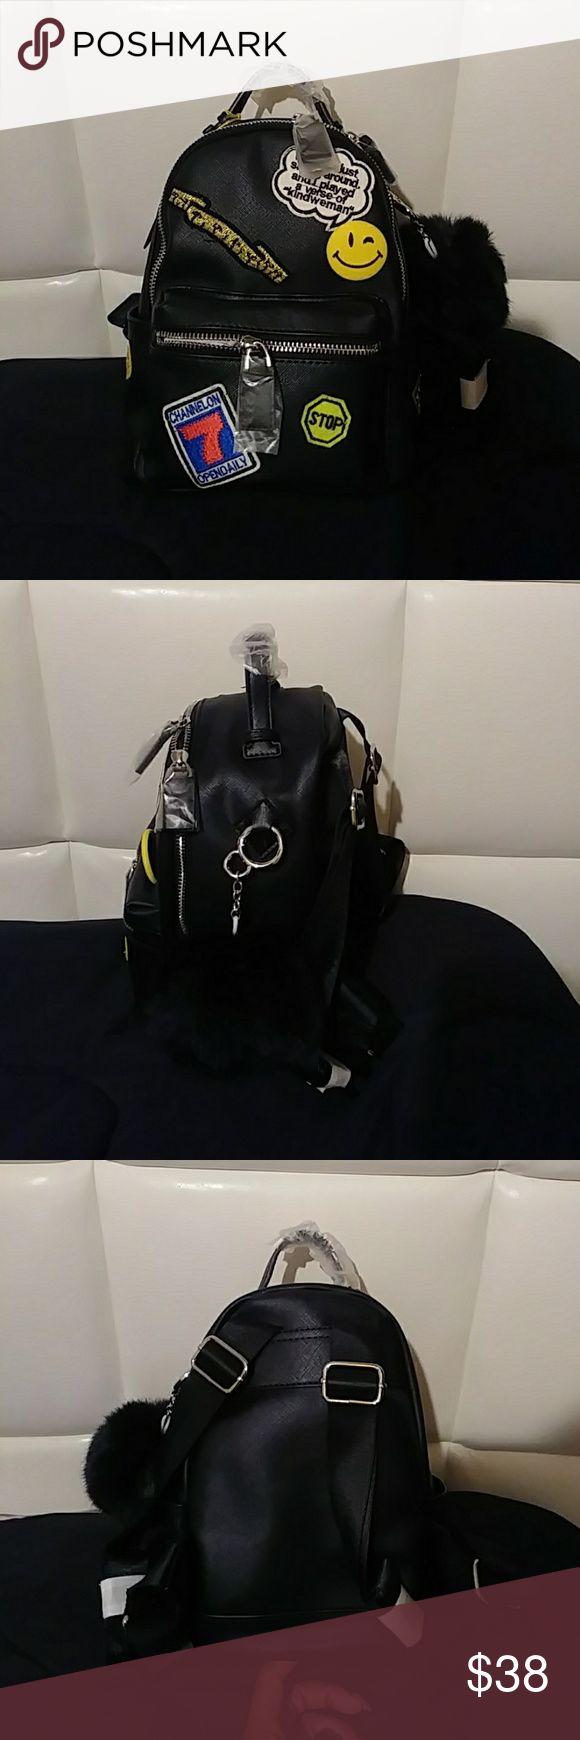 Mini Fashion Emoji Backpack Trendy mini black backpack, large enough to keep a 17 in tablet Bags Backpacks